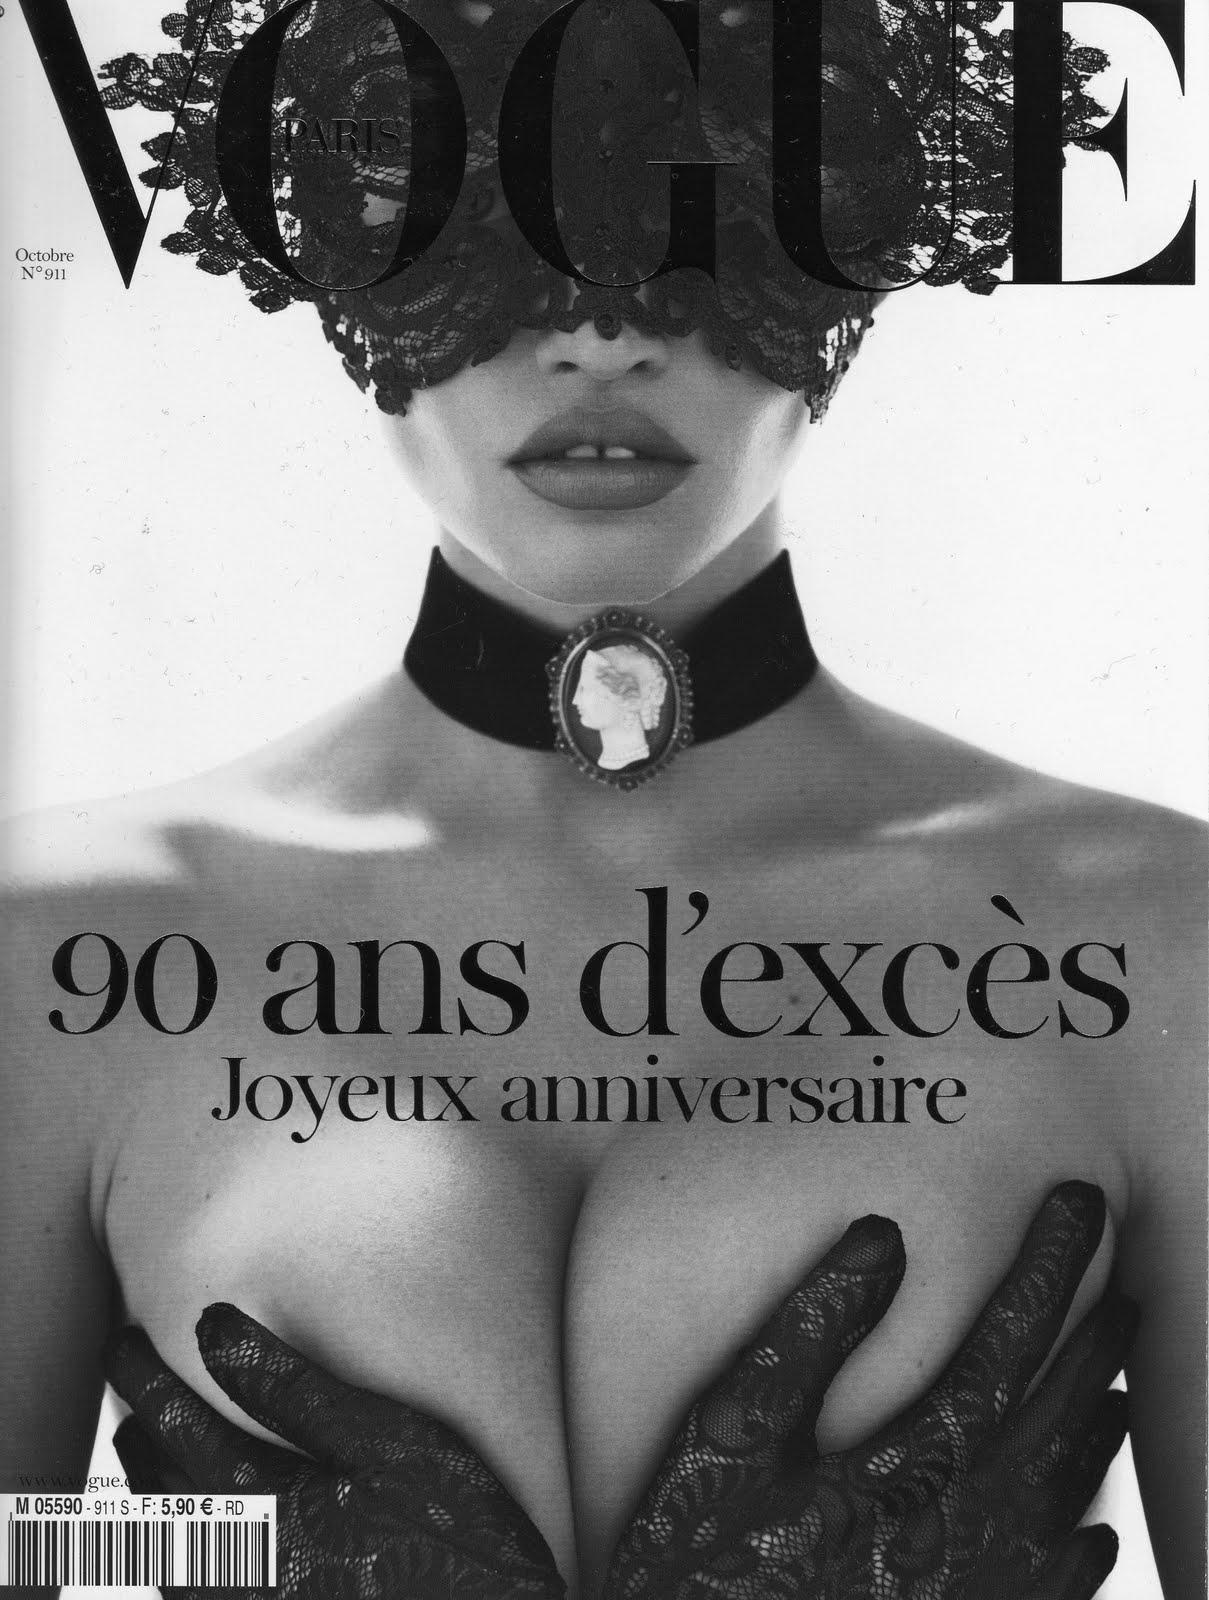 http://4.bp.blogspot.com/_c_eWWE12TP8/TMdho0SzXYI/AAAAAAAAHsE/ixFM9161wmQ/s1600/Lara+Stone+Vogue+Paris.jpg